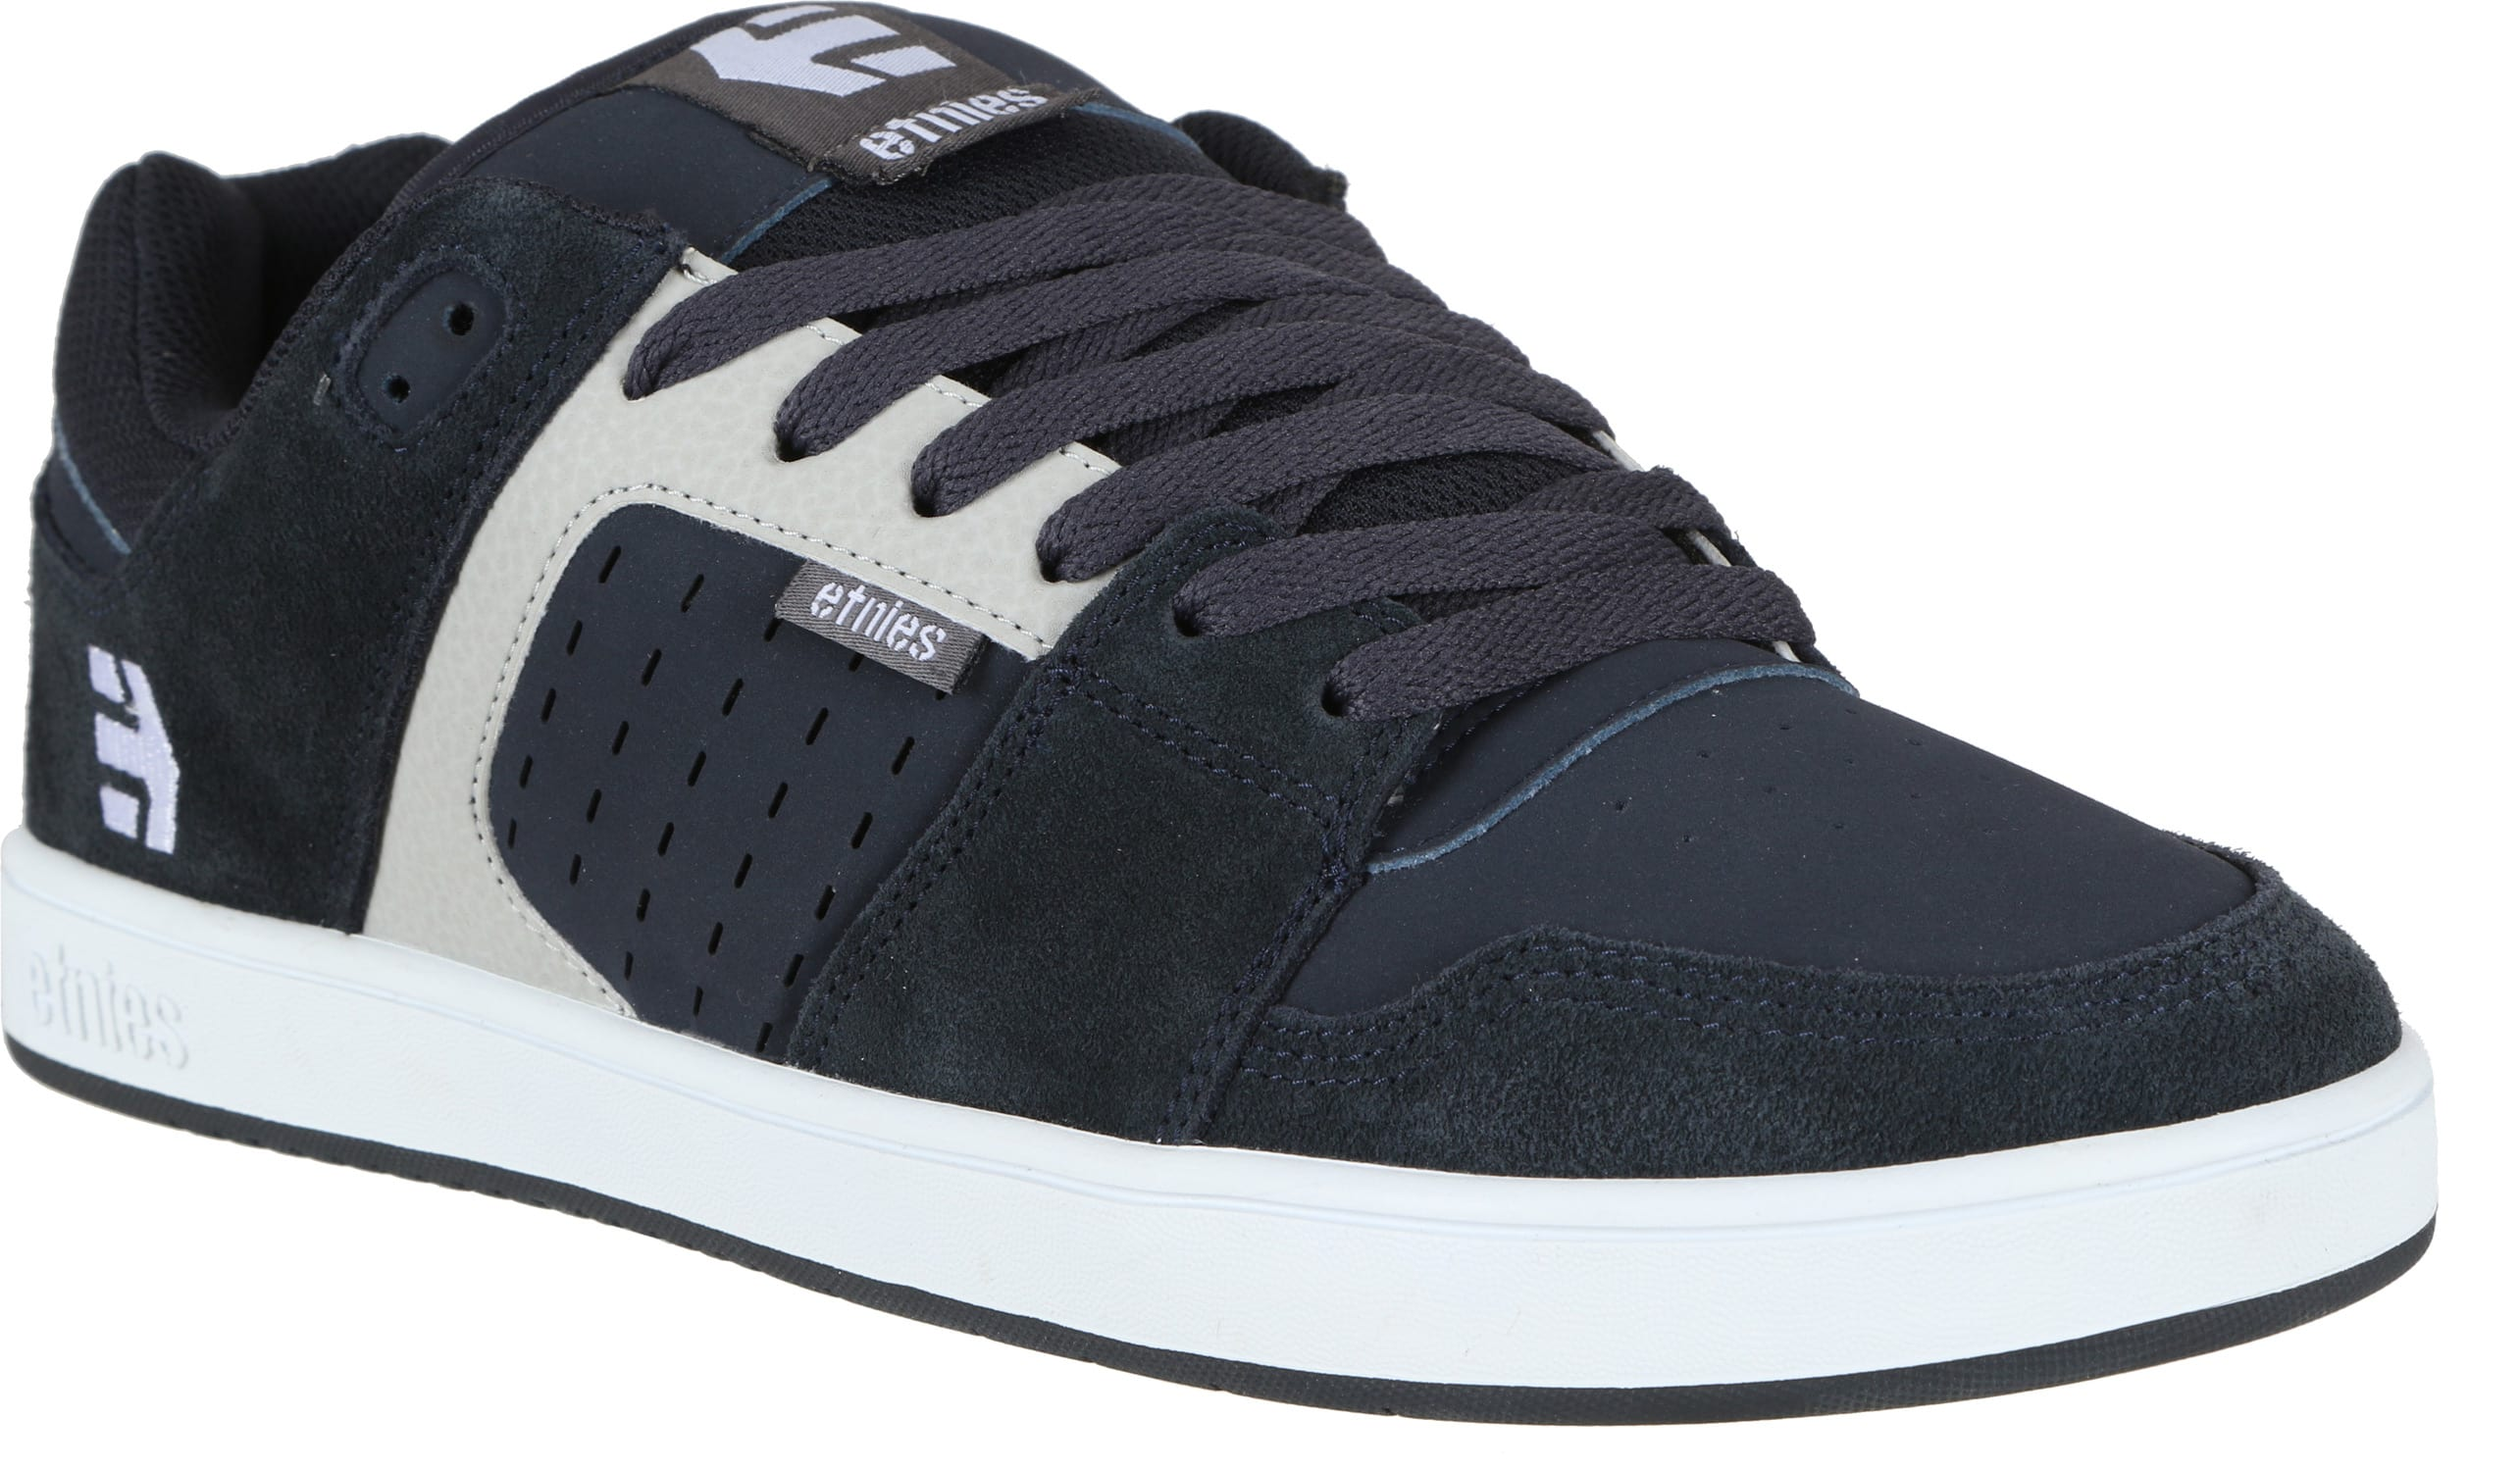 Etnies Rockfield Skate Shoes